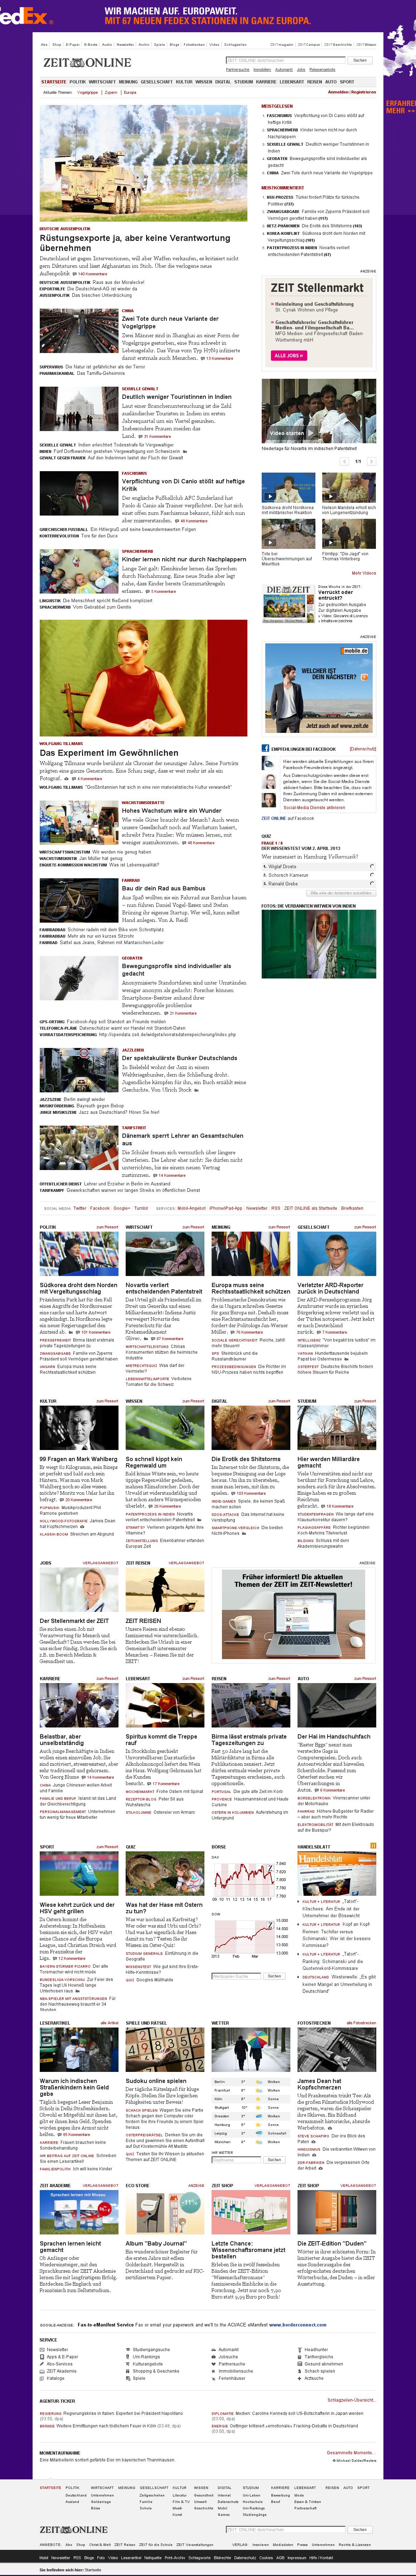 Zeit Online at Tuesday April 2, 2013, 2:26 a.m. UTC